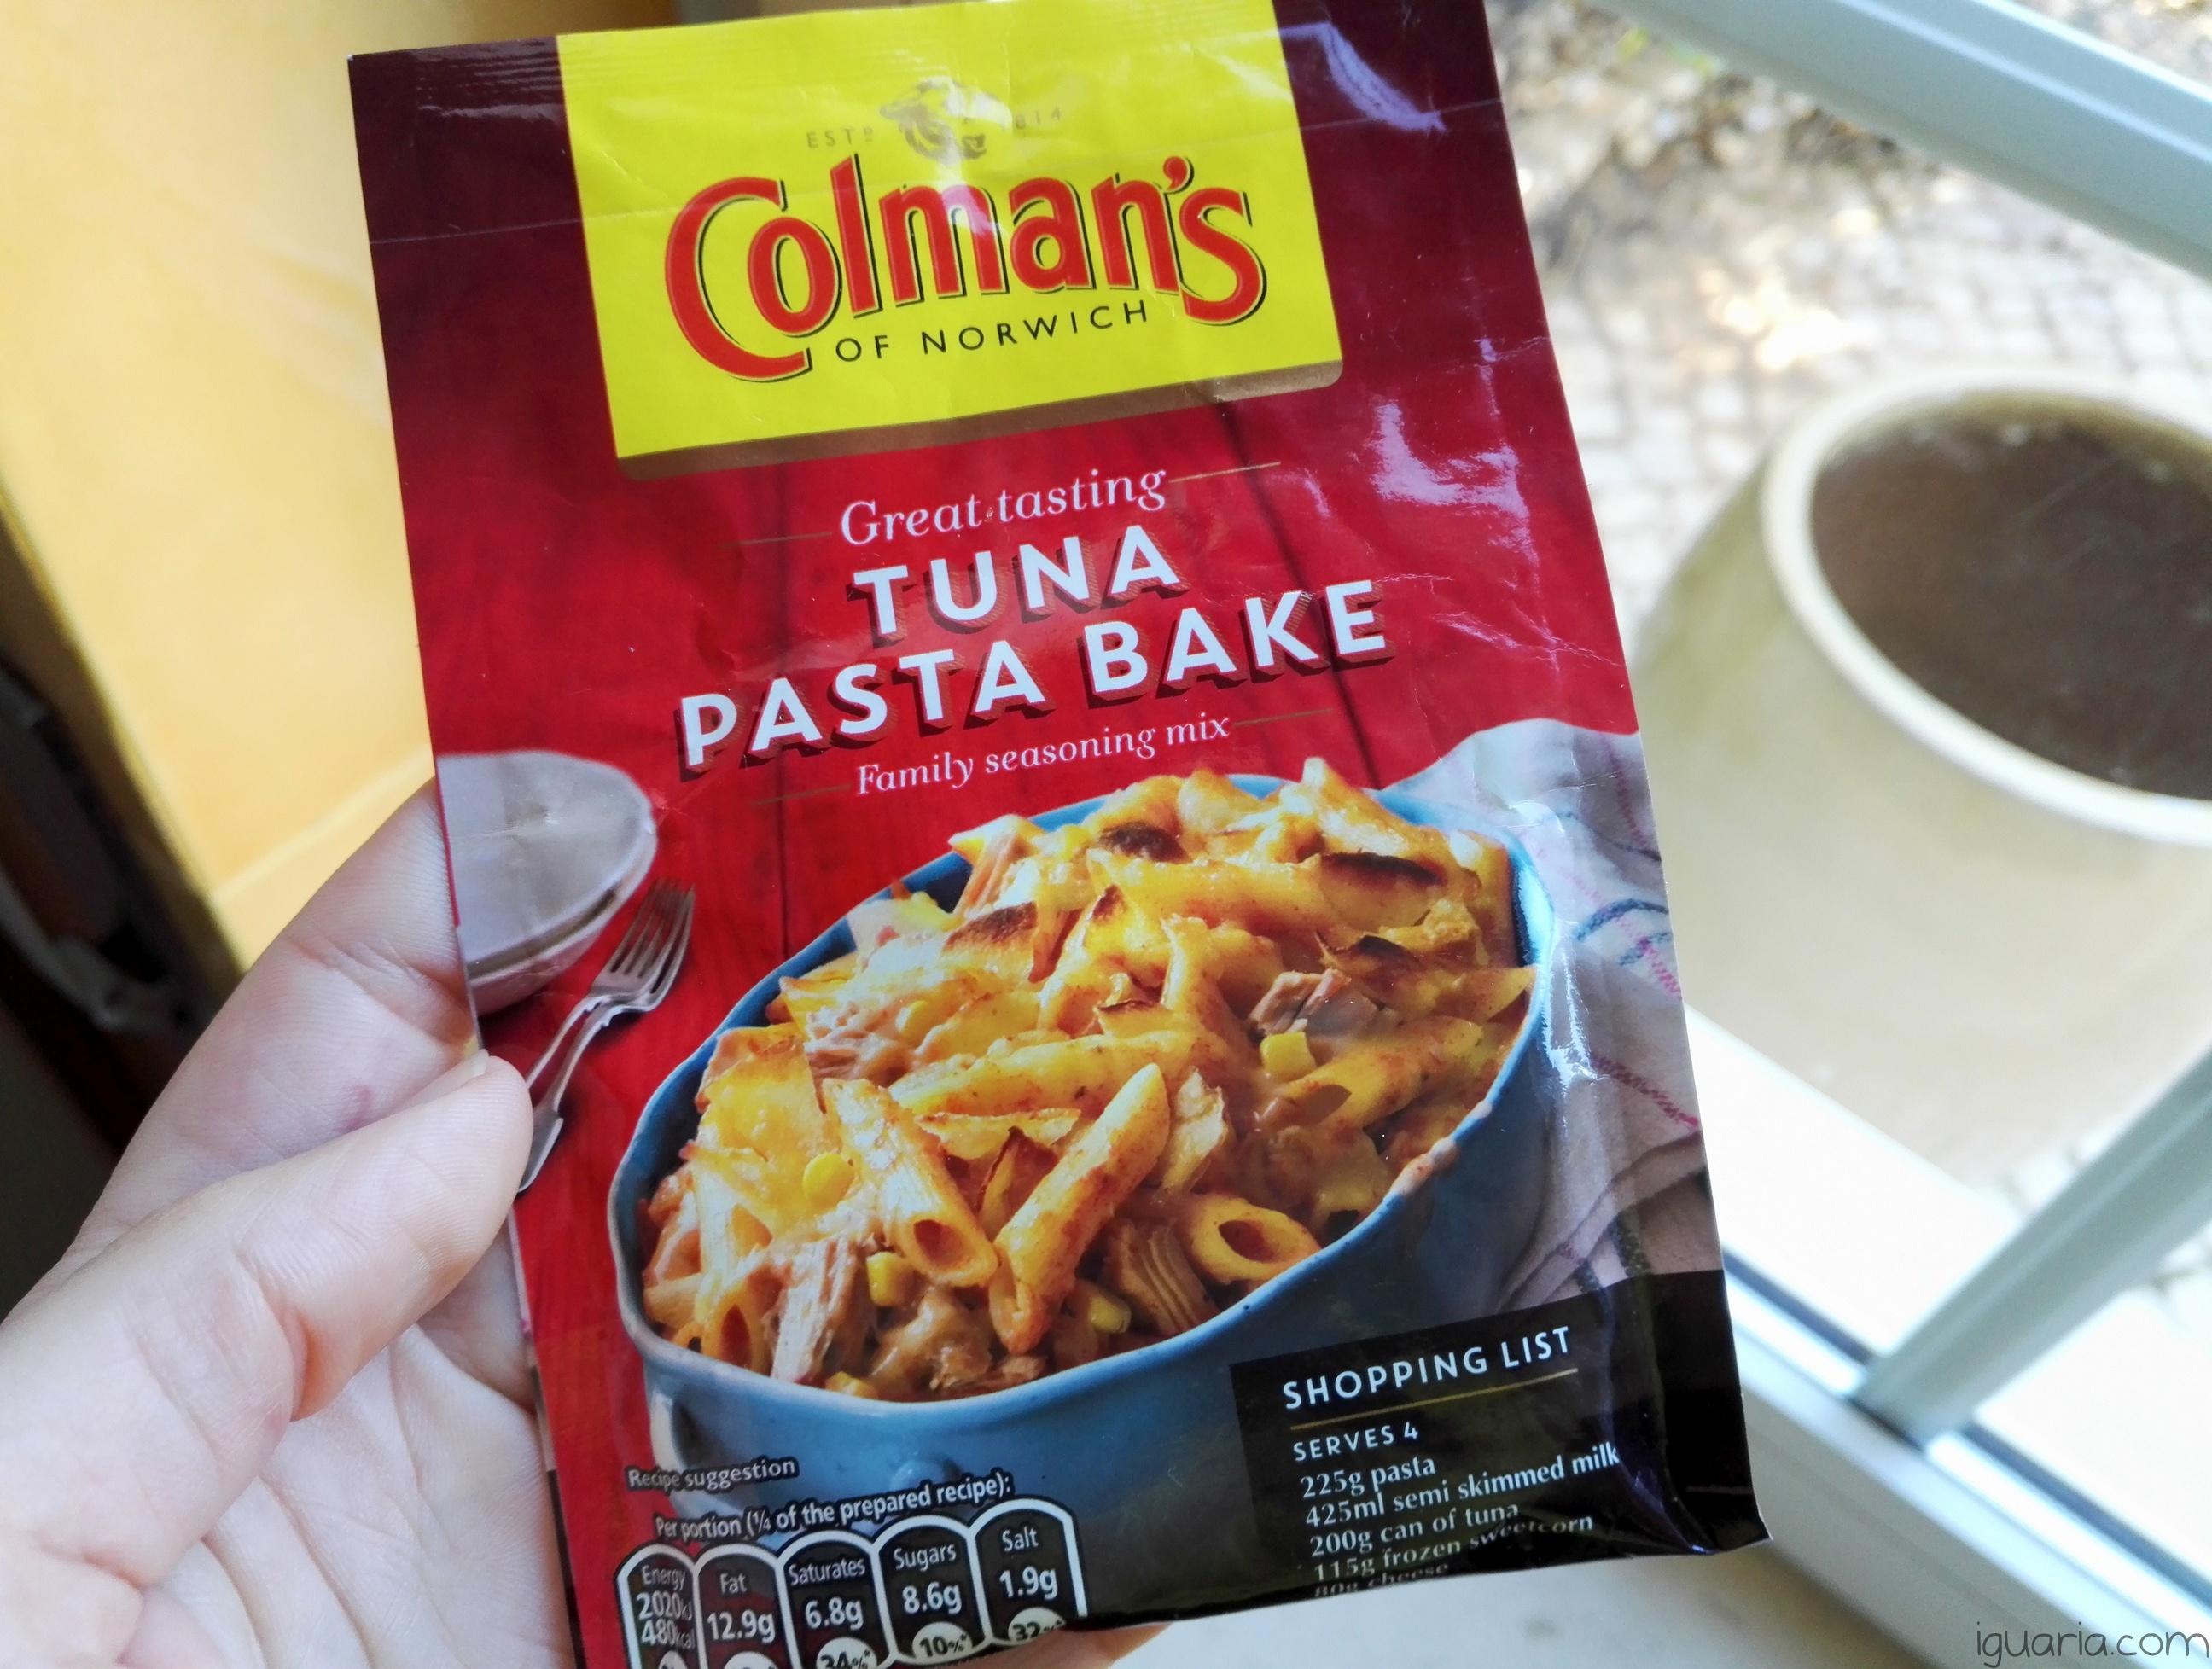 Iguaria_Colmans-Tuna-Pasta-Bake